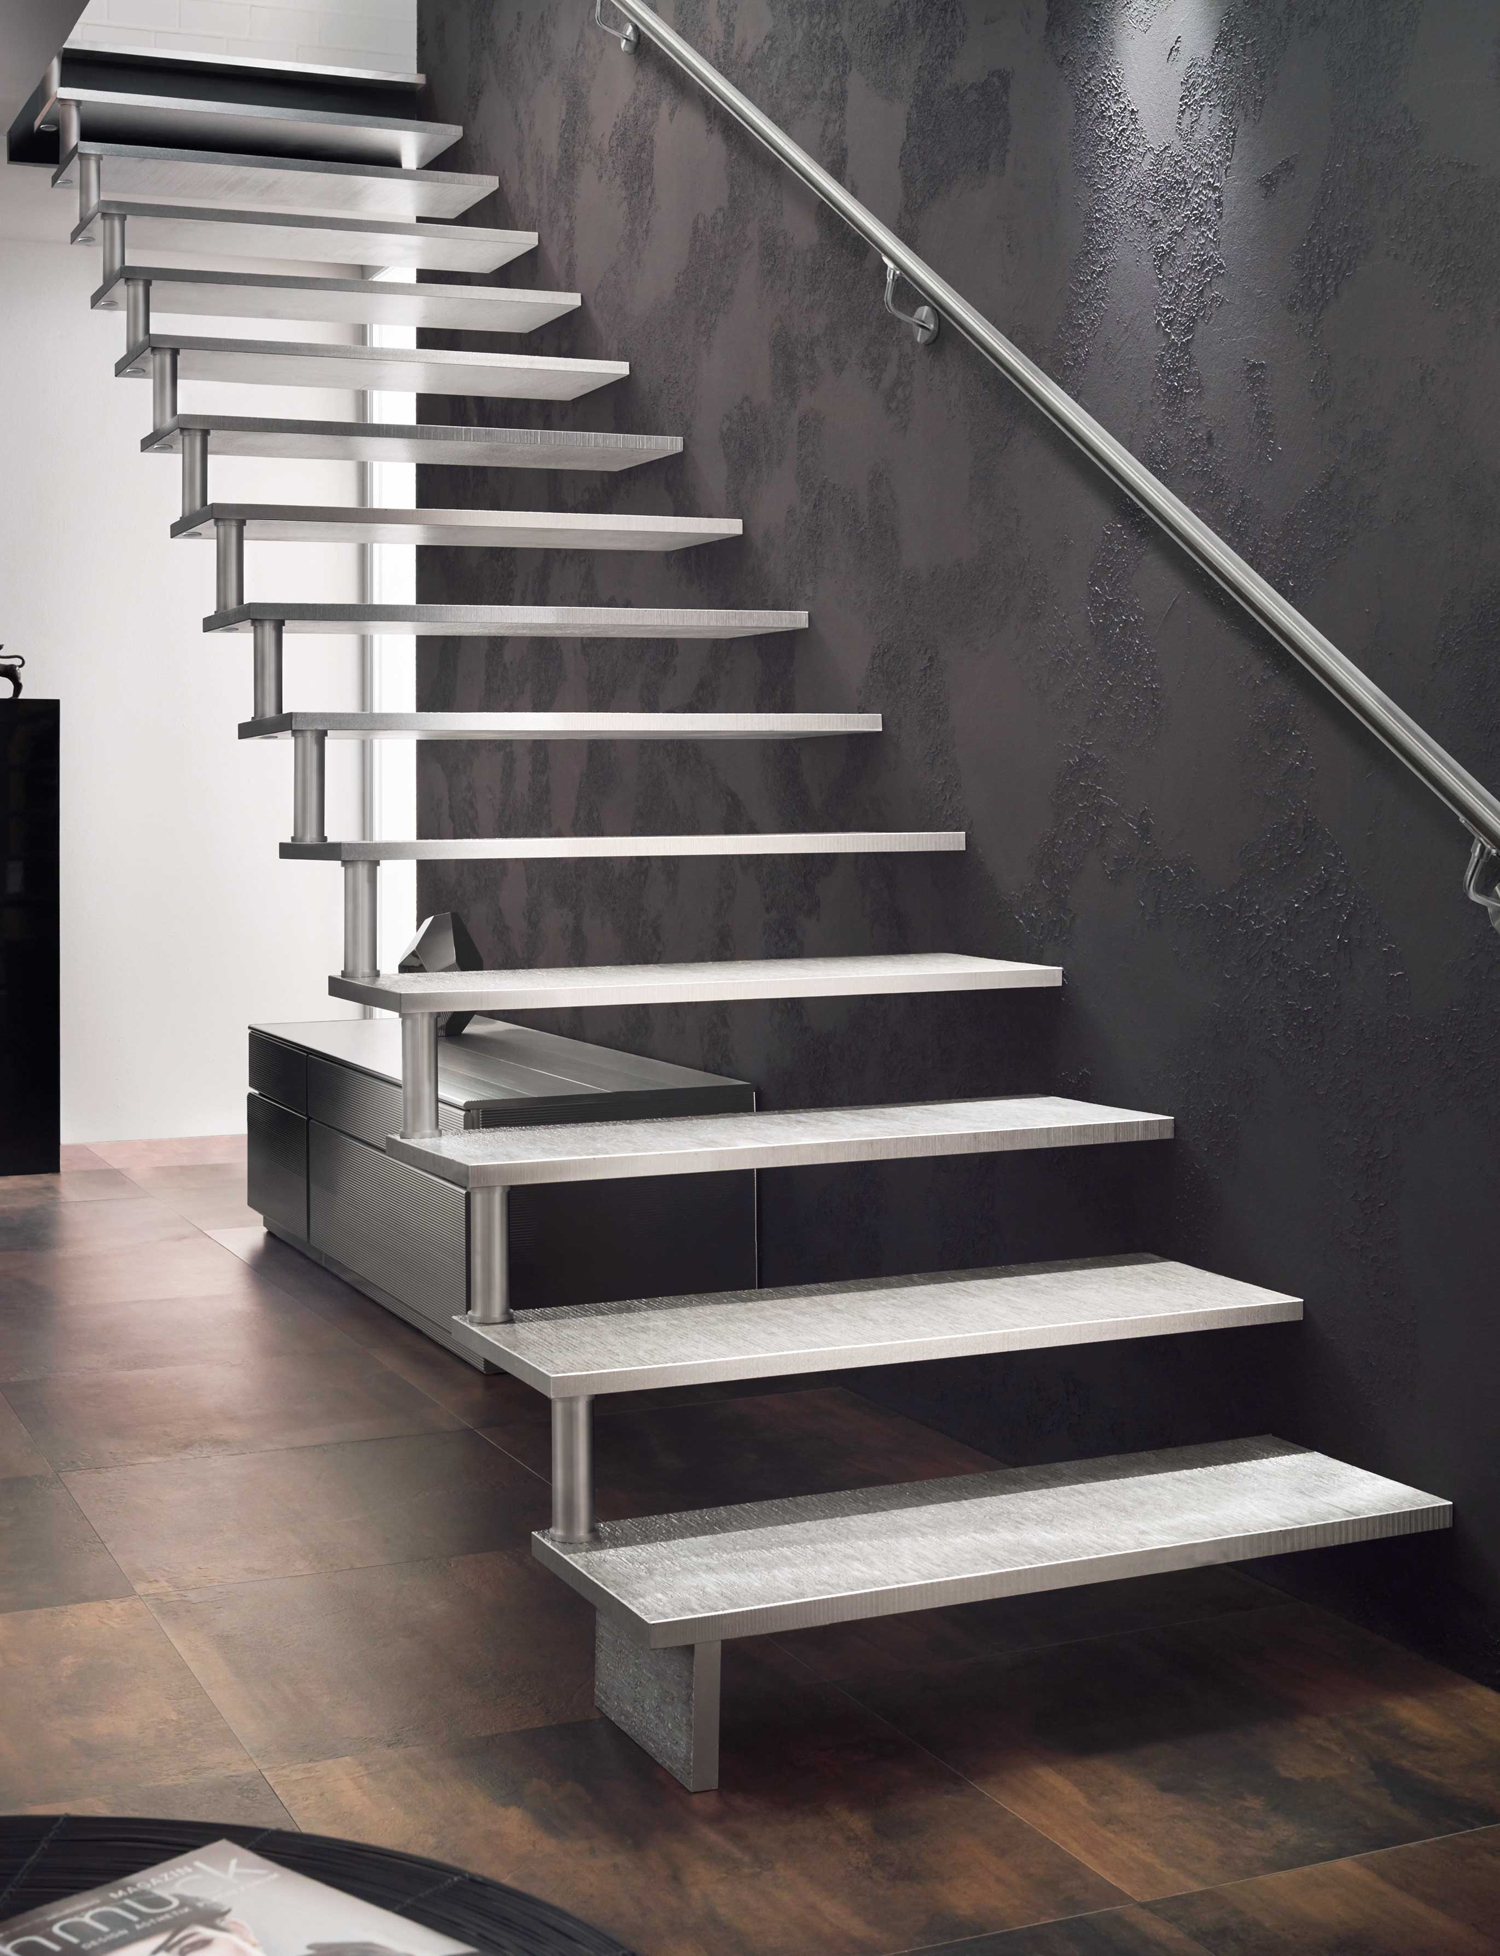 Areo – Ästhetik trifft Zeitgeist puristische Aluminiumtreppe Areo von Treppenmeister